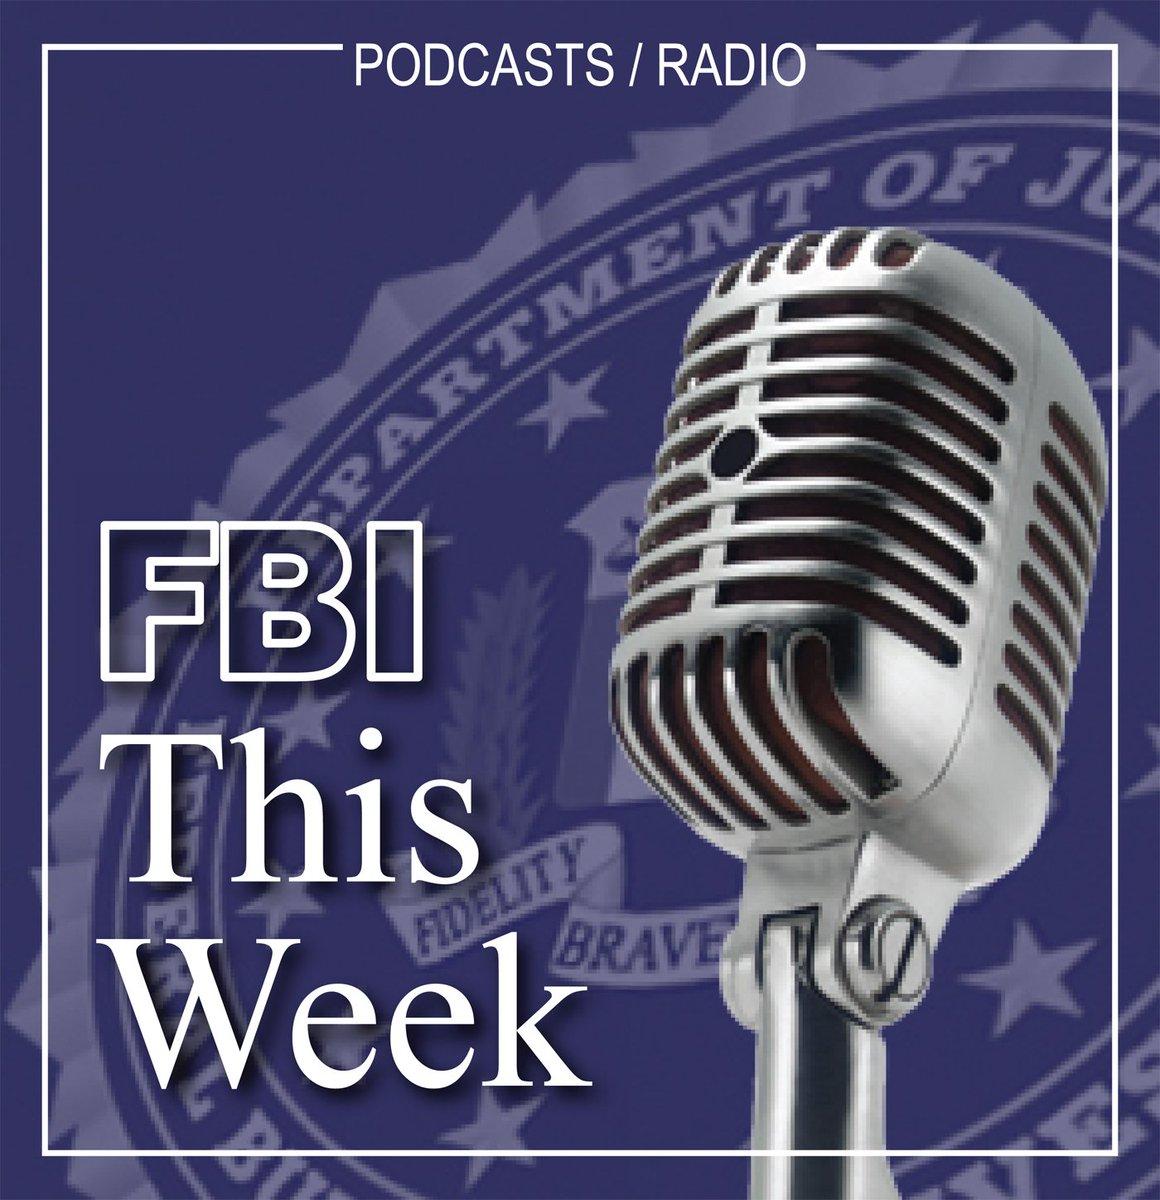 #ICYMI: Last week, the #FBI released the 2016 Hate Crime Statistics Report. fbi.gov/audio-reposito…